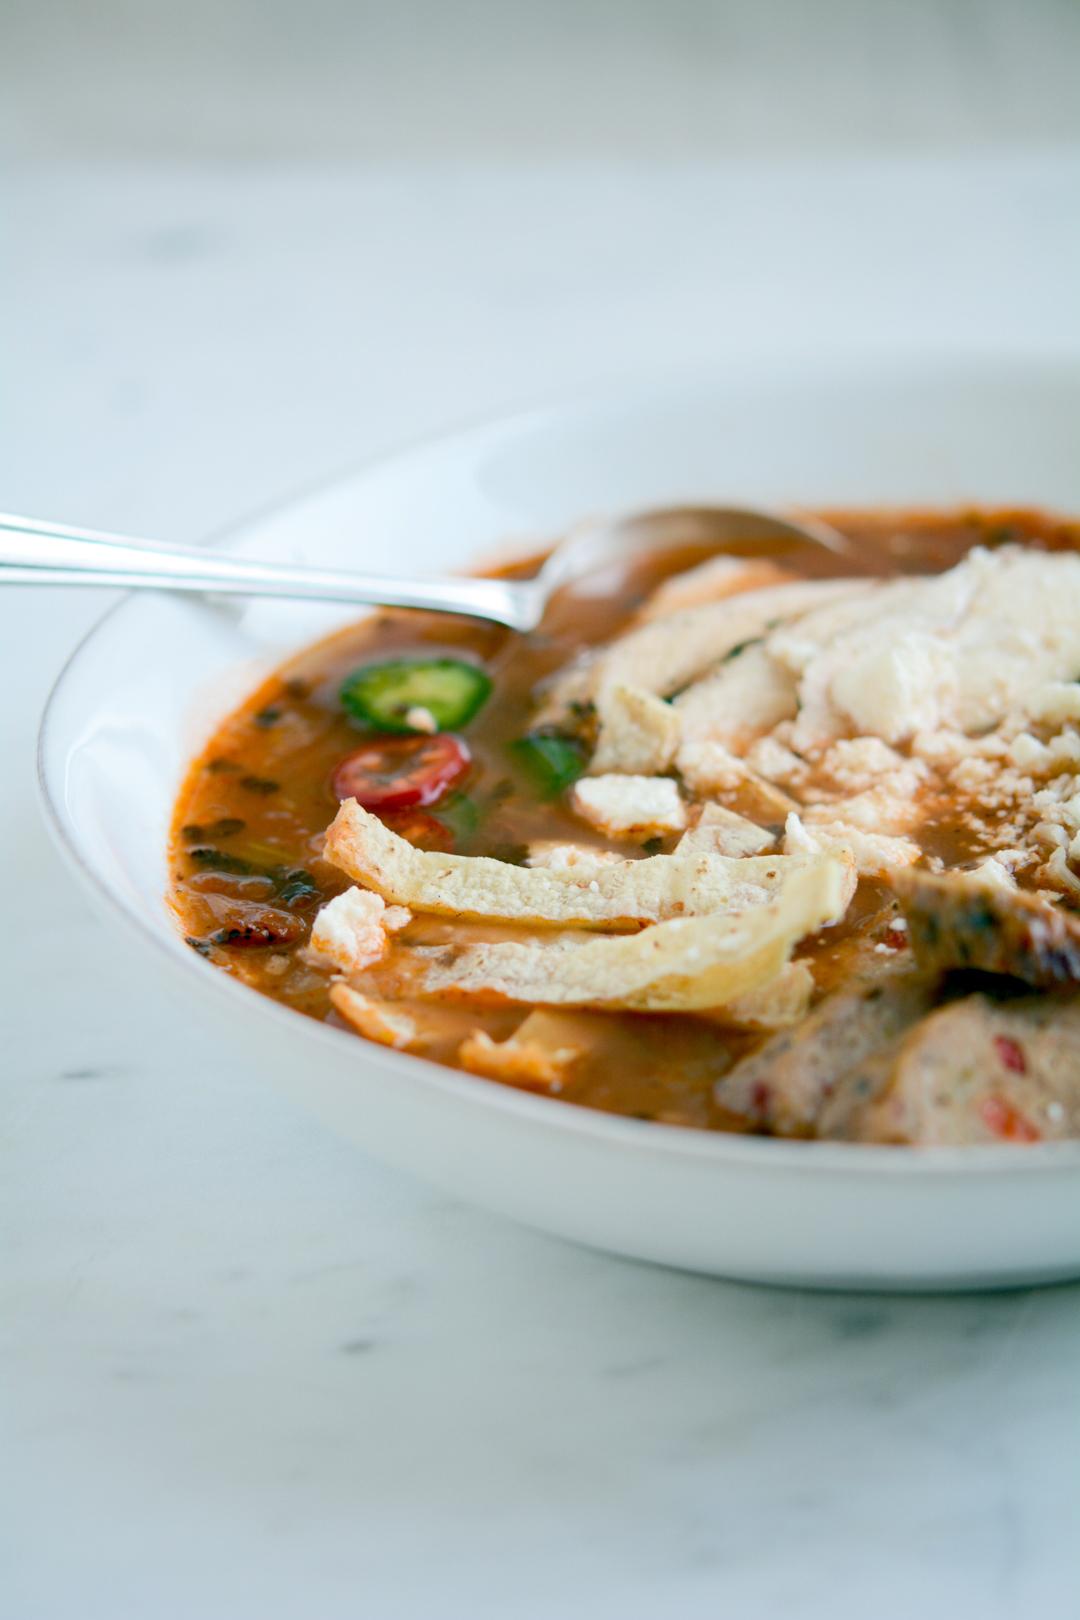 Tortilla soup in a bowl